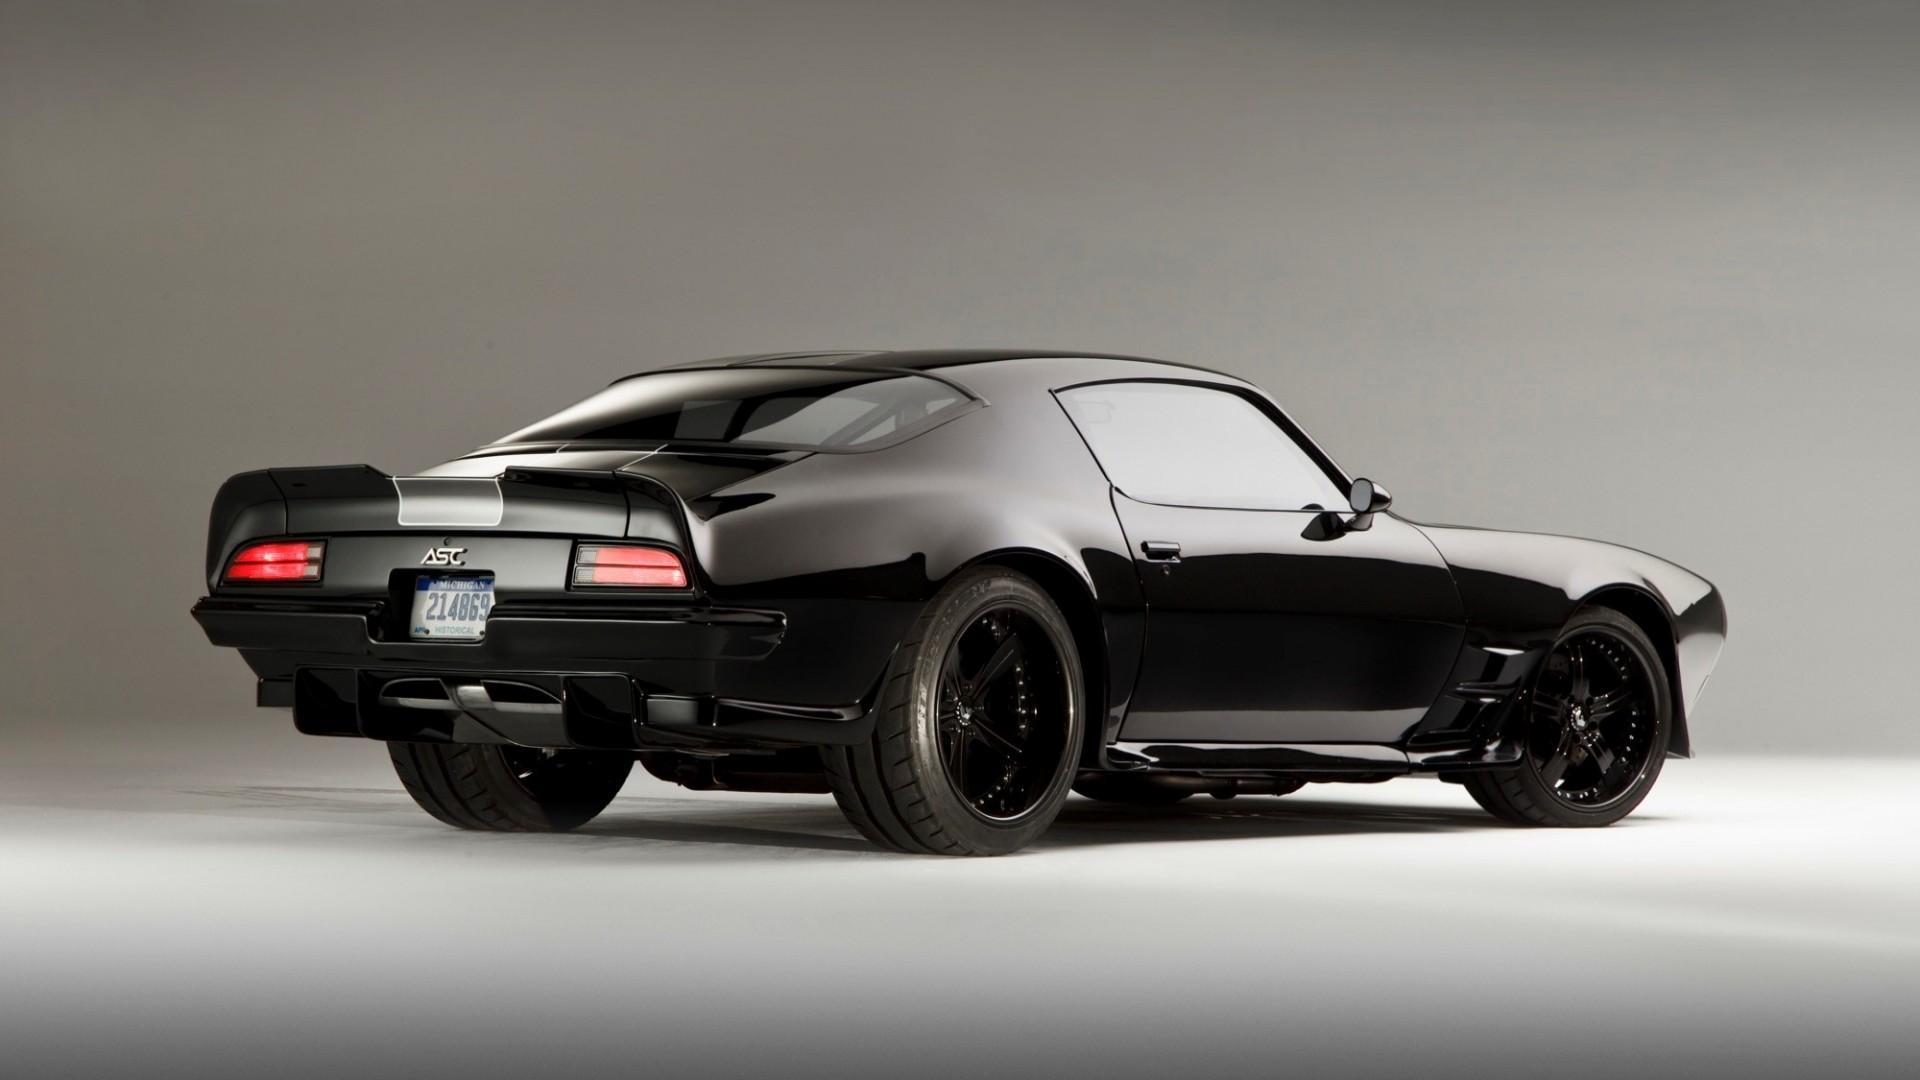 black cars sports cars pontiac firebird 1970 customized muscle car  garage hot rod muscle wallpaper | | 29856 | WallpaperUP